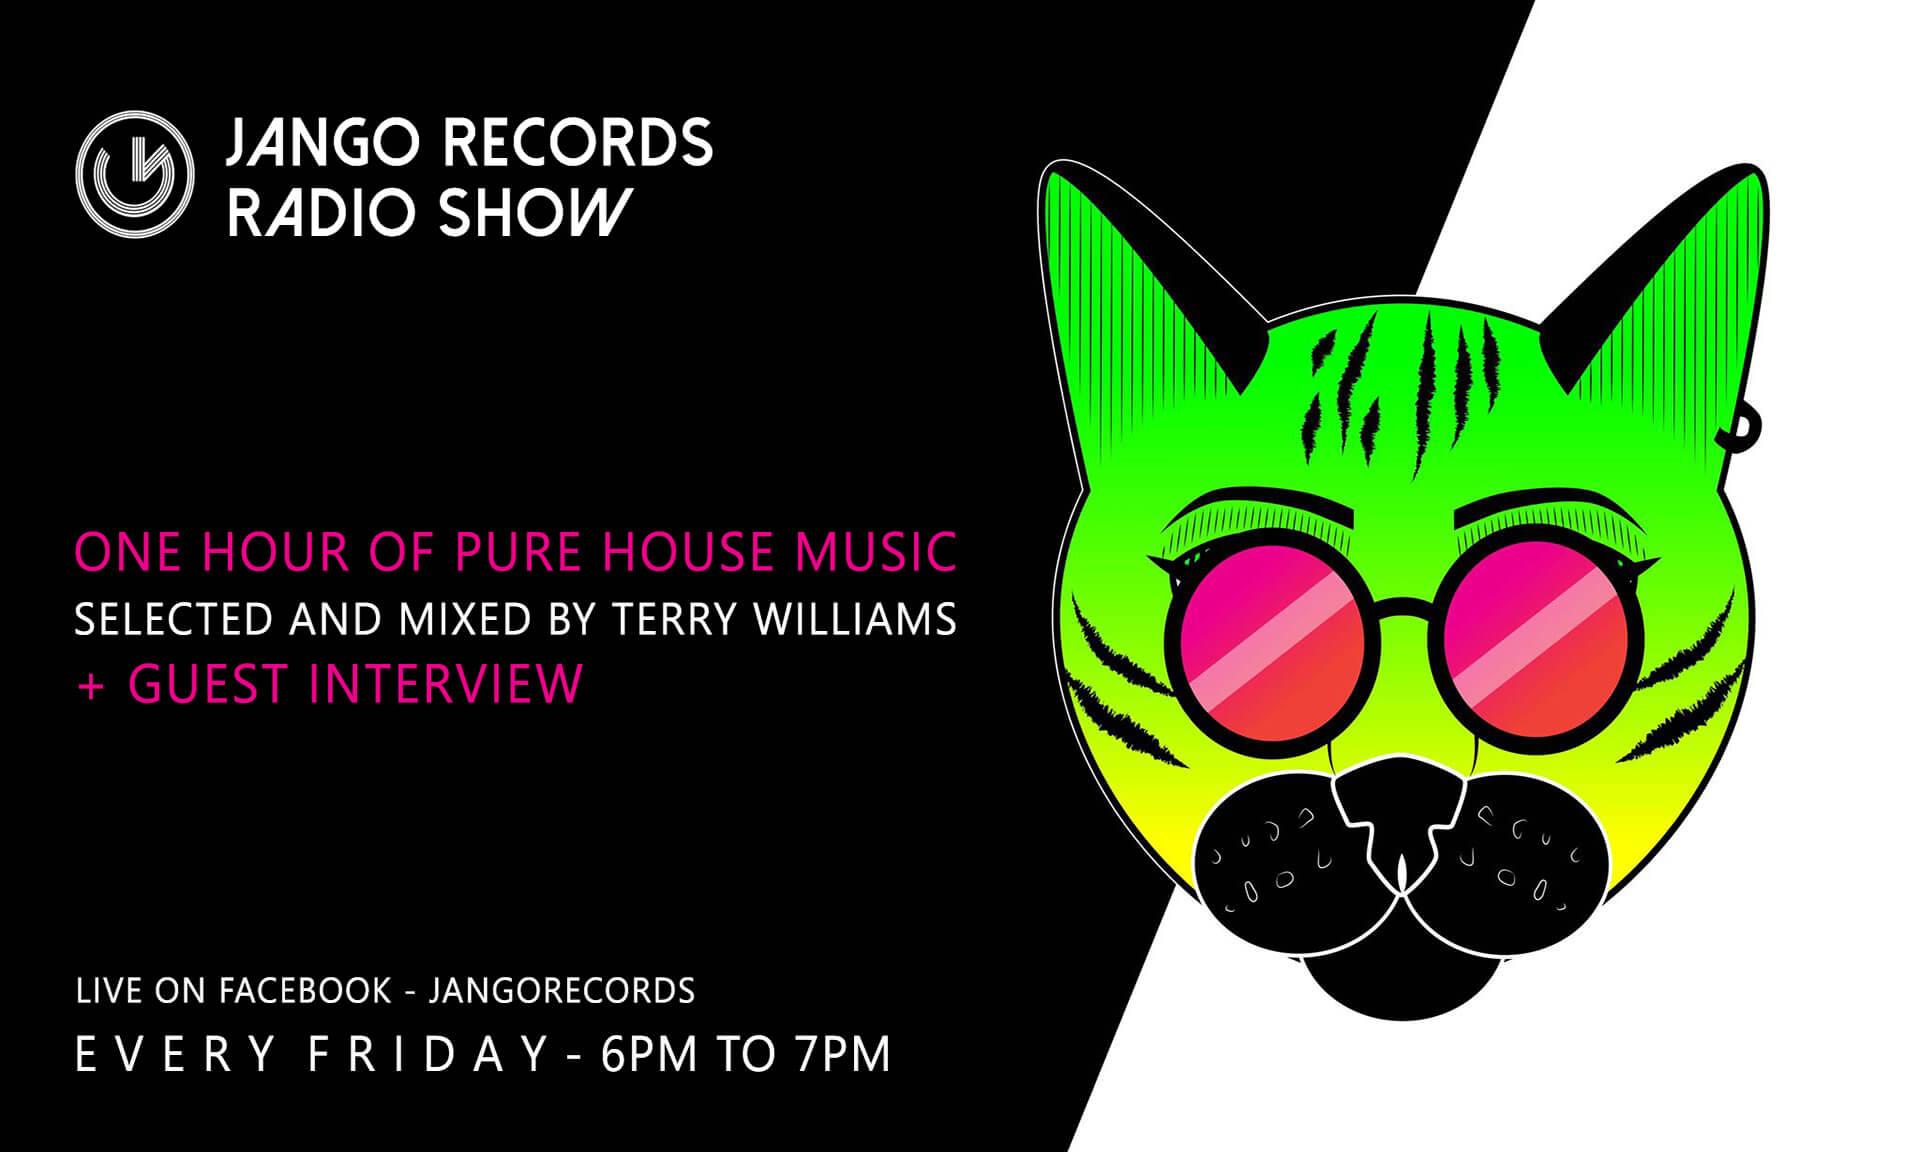 Jango Records weekly Radio Show